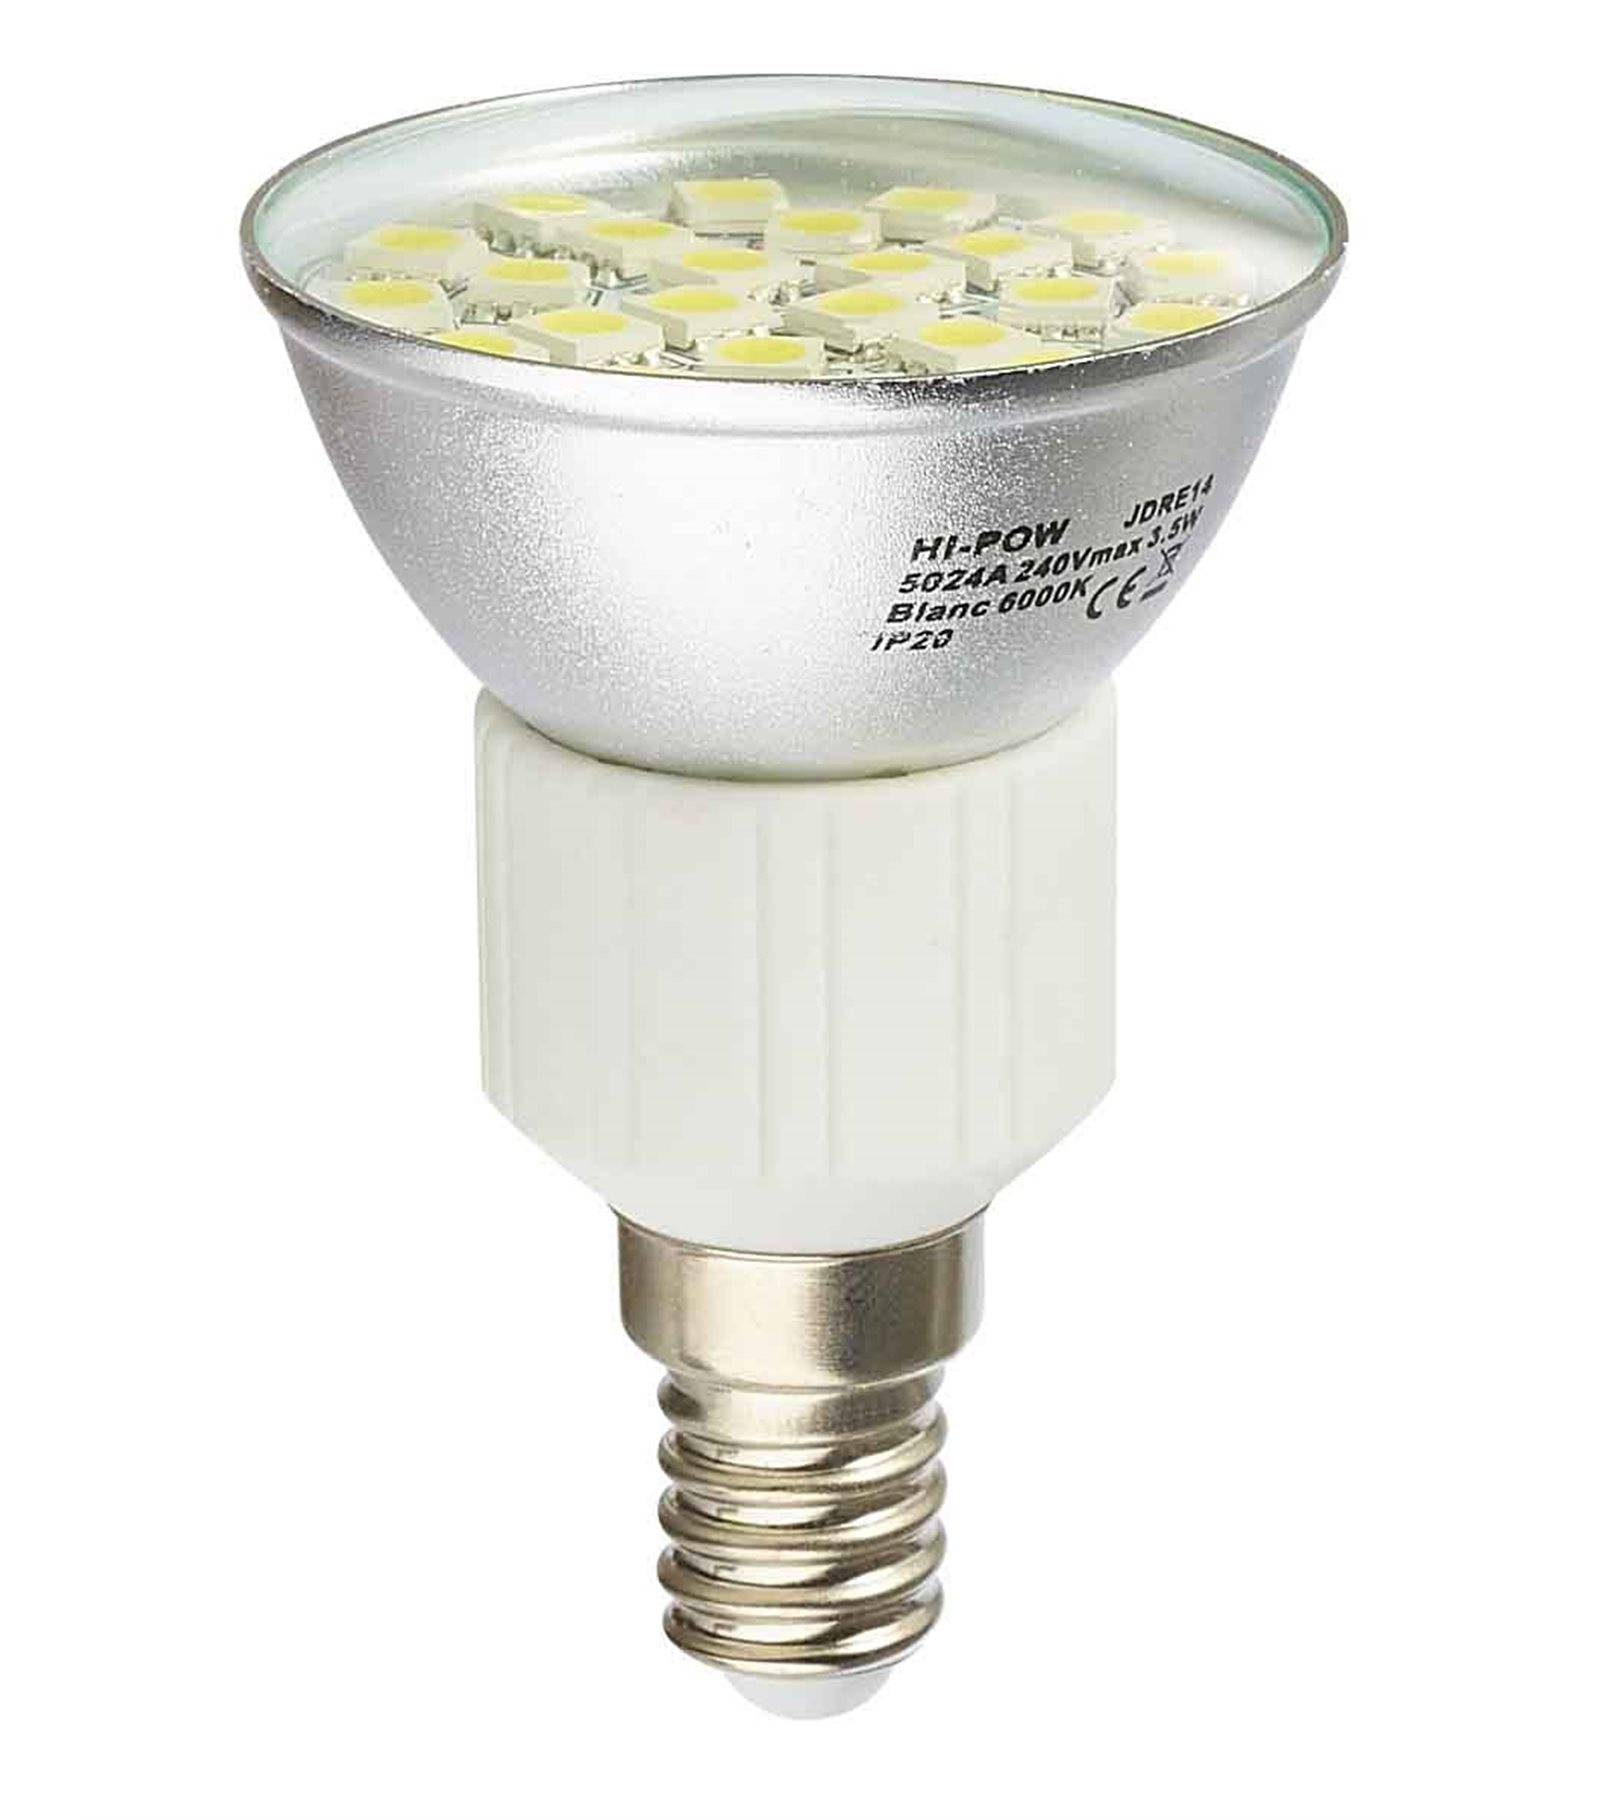 ampoule led e14 dimmable 24 smd5024 3 5w 310lm quiv 31w blanc froid 120 hipow ampoule. Black Bedroom Furniture Sets. Home Design Ideas